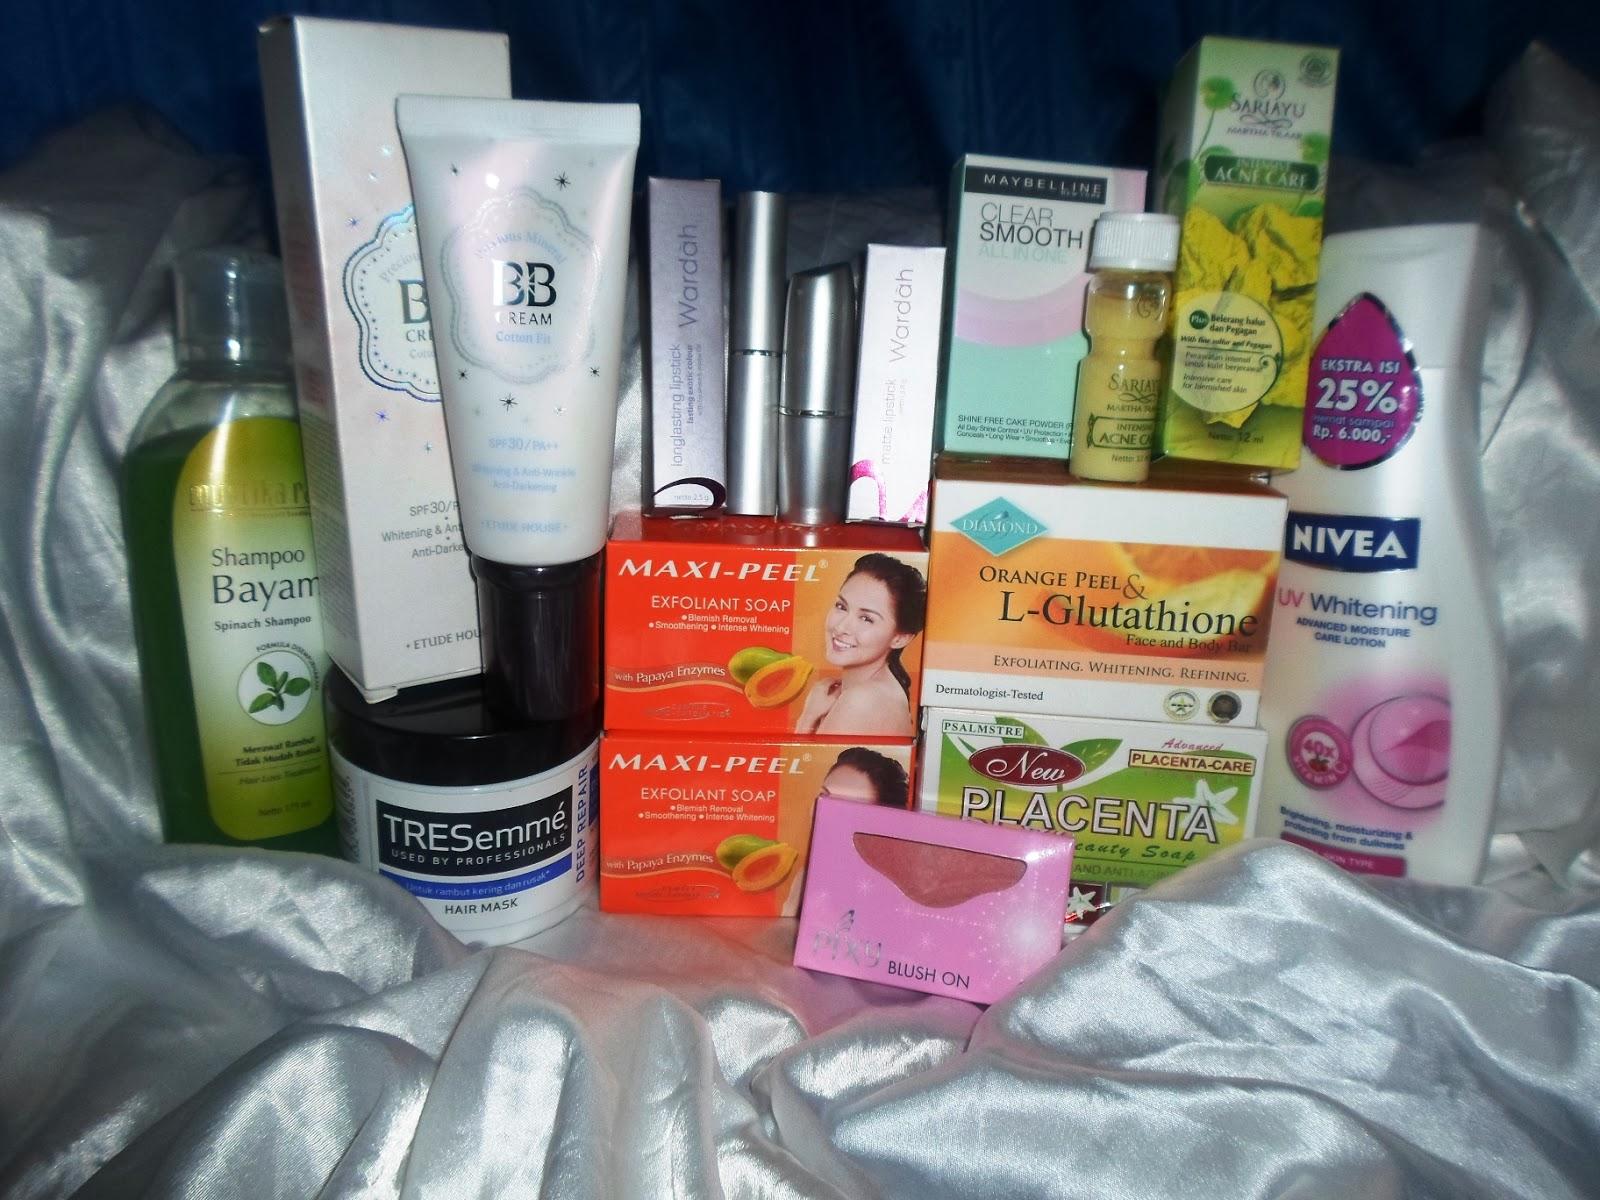 Inside My Beauty Pouch December Haul Mustika Ratu Complete Whitening Series Shampoo Bayam Hair Loss Treatment